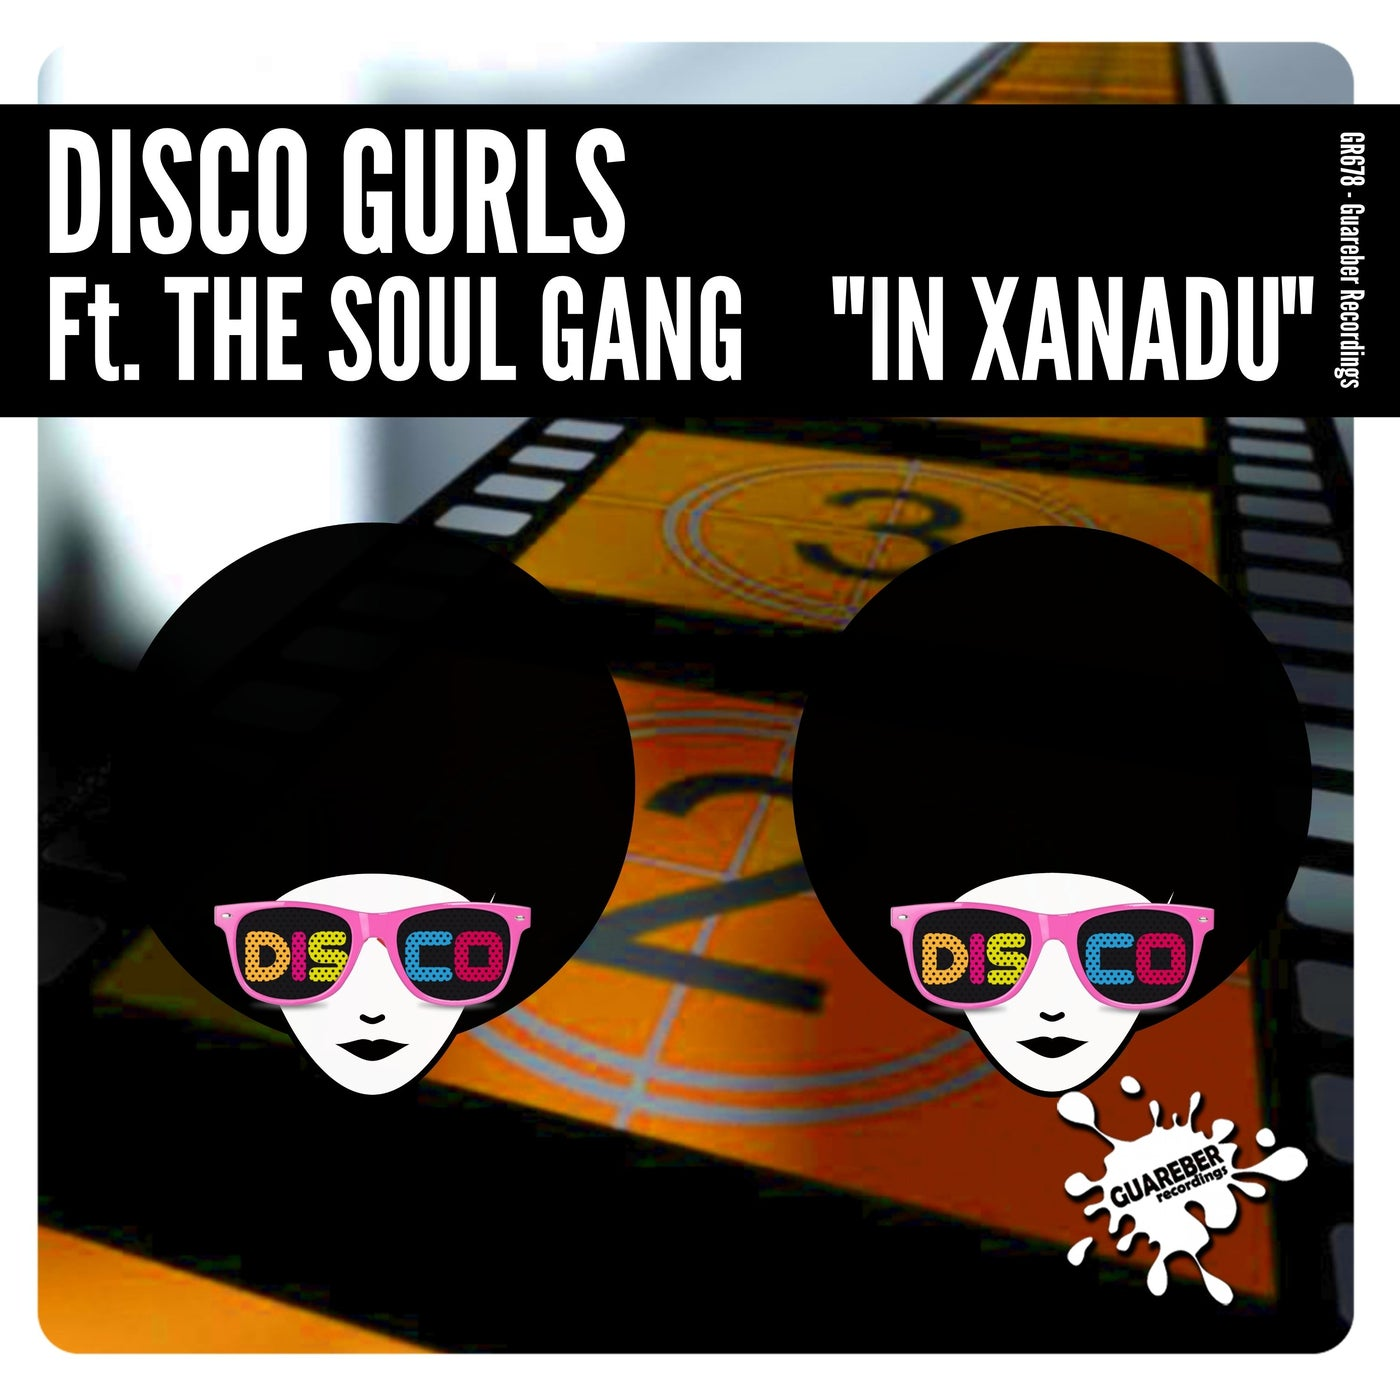 In Xanadu (Extended Mix)